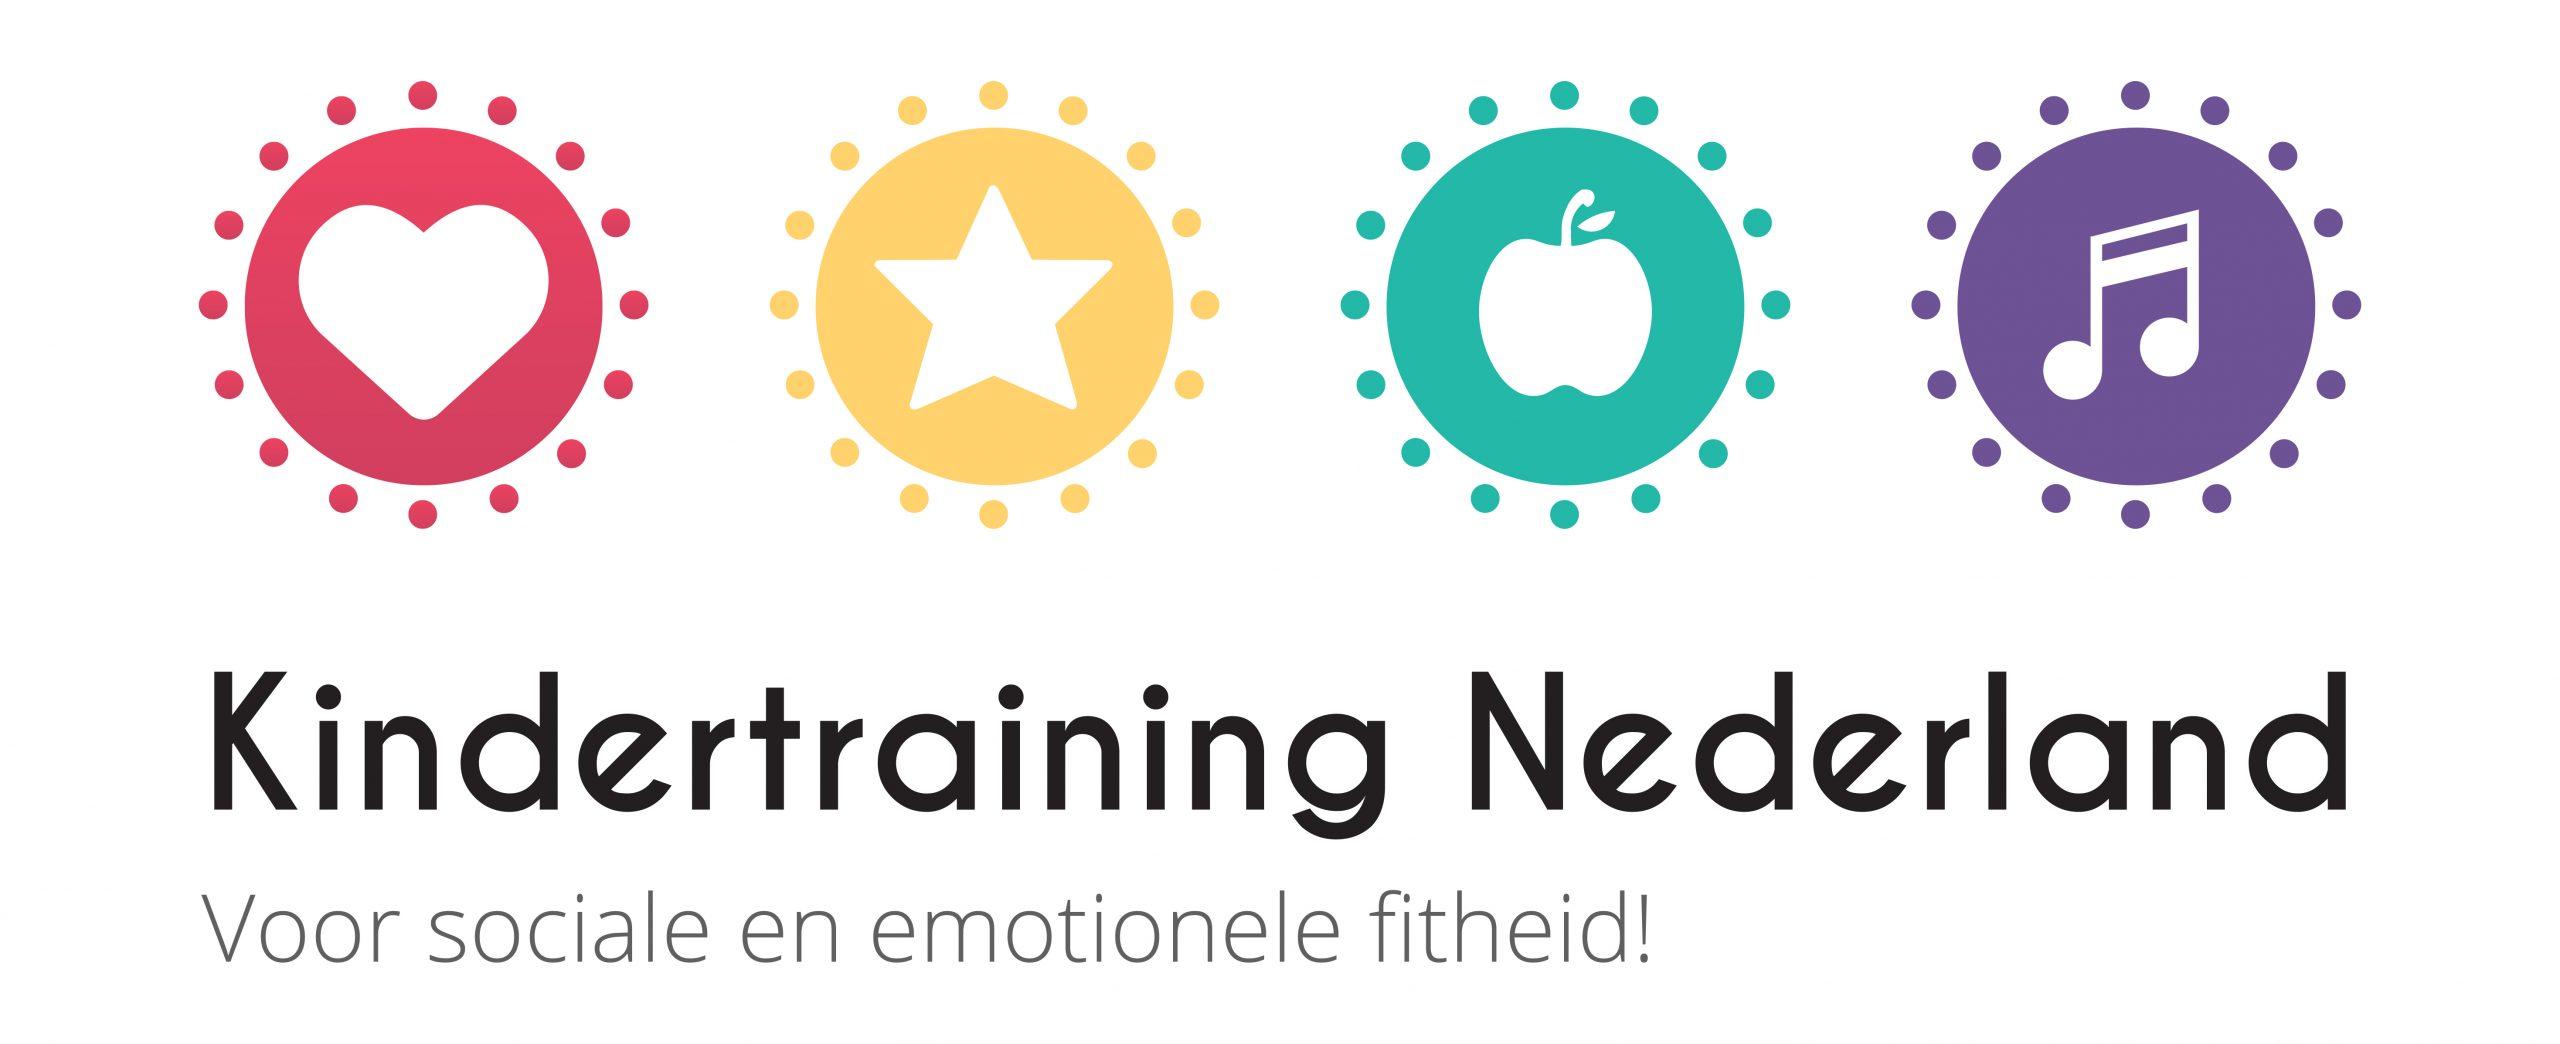 Kindertraining Nederland - Ik ZIt Lekker In Mijn Vel!